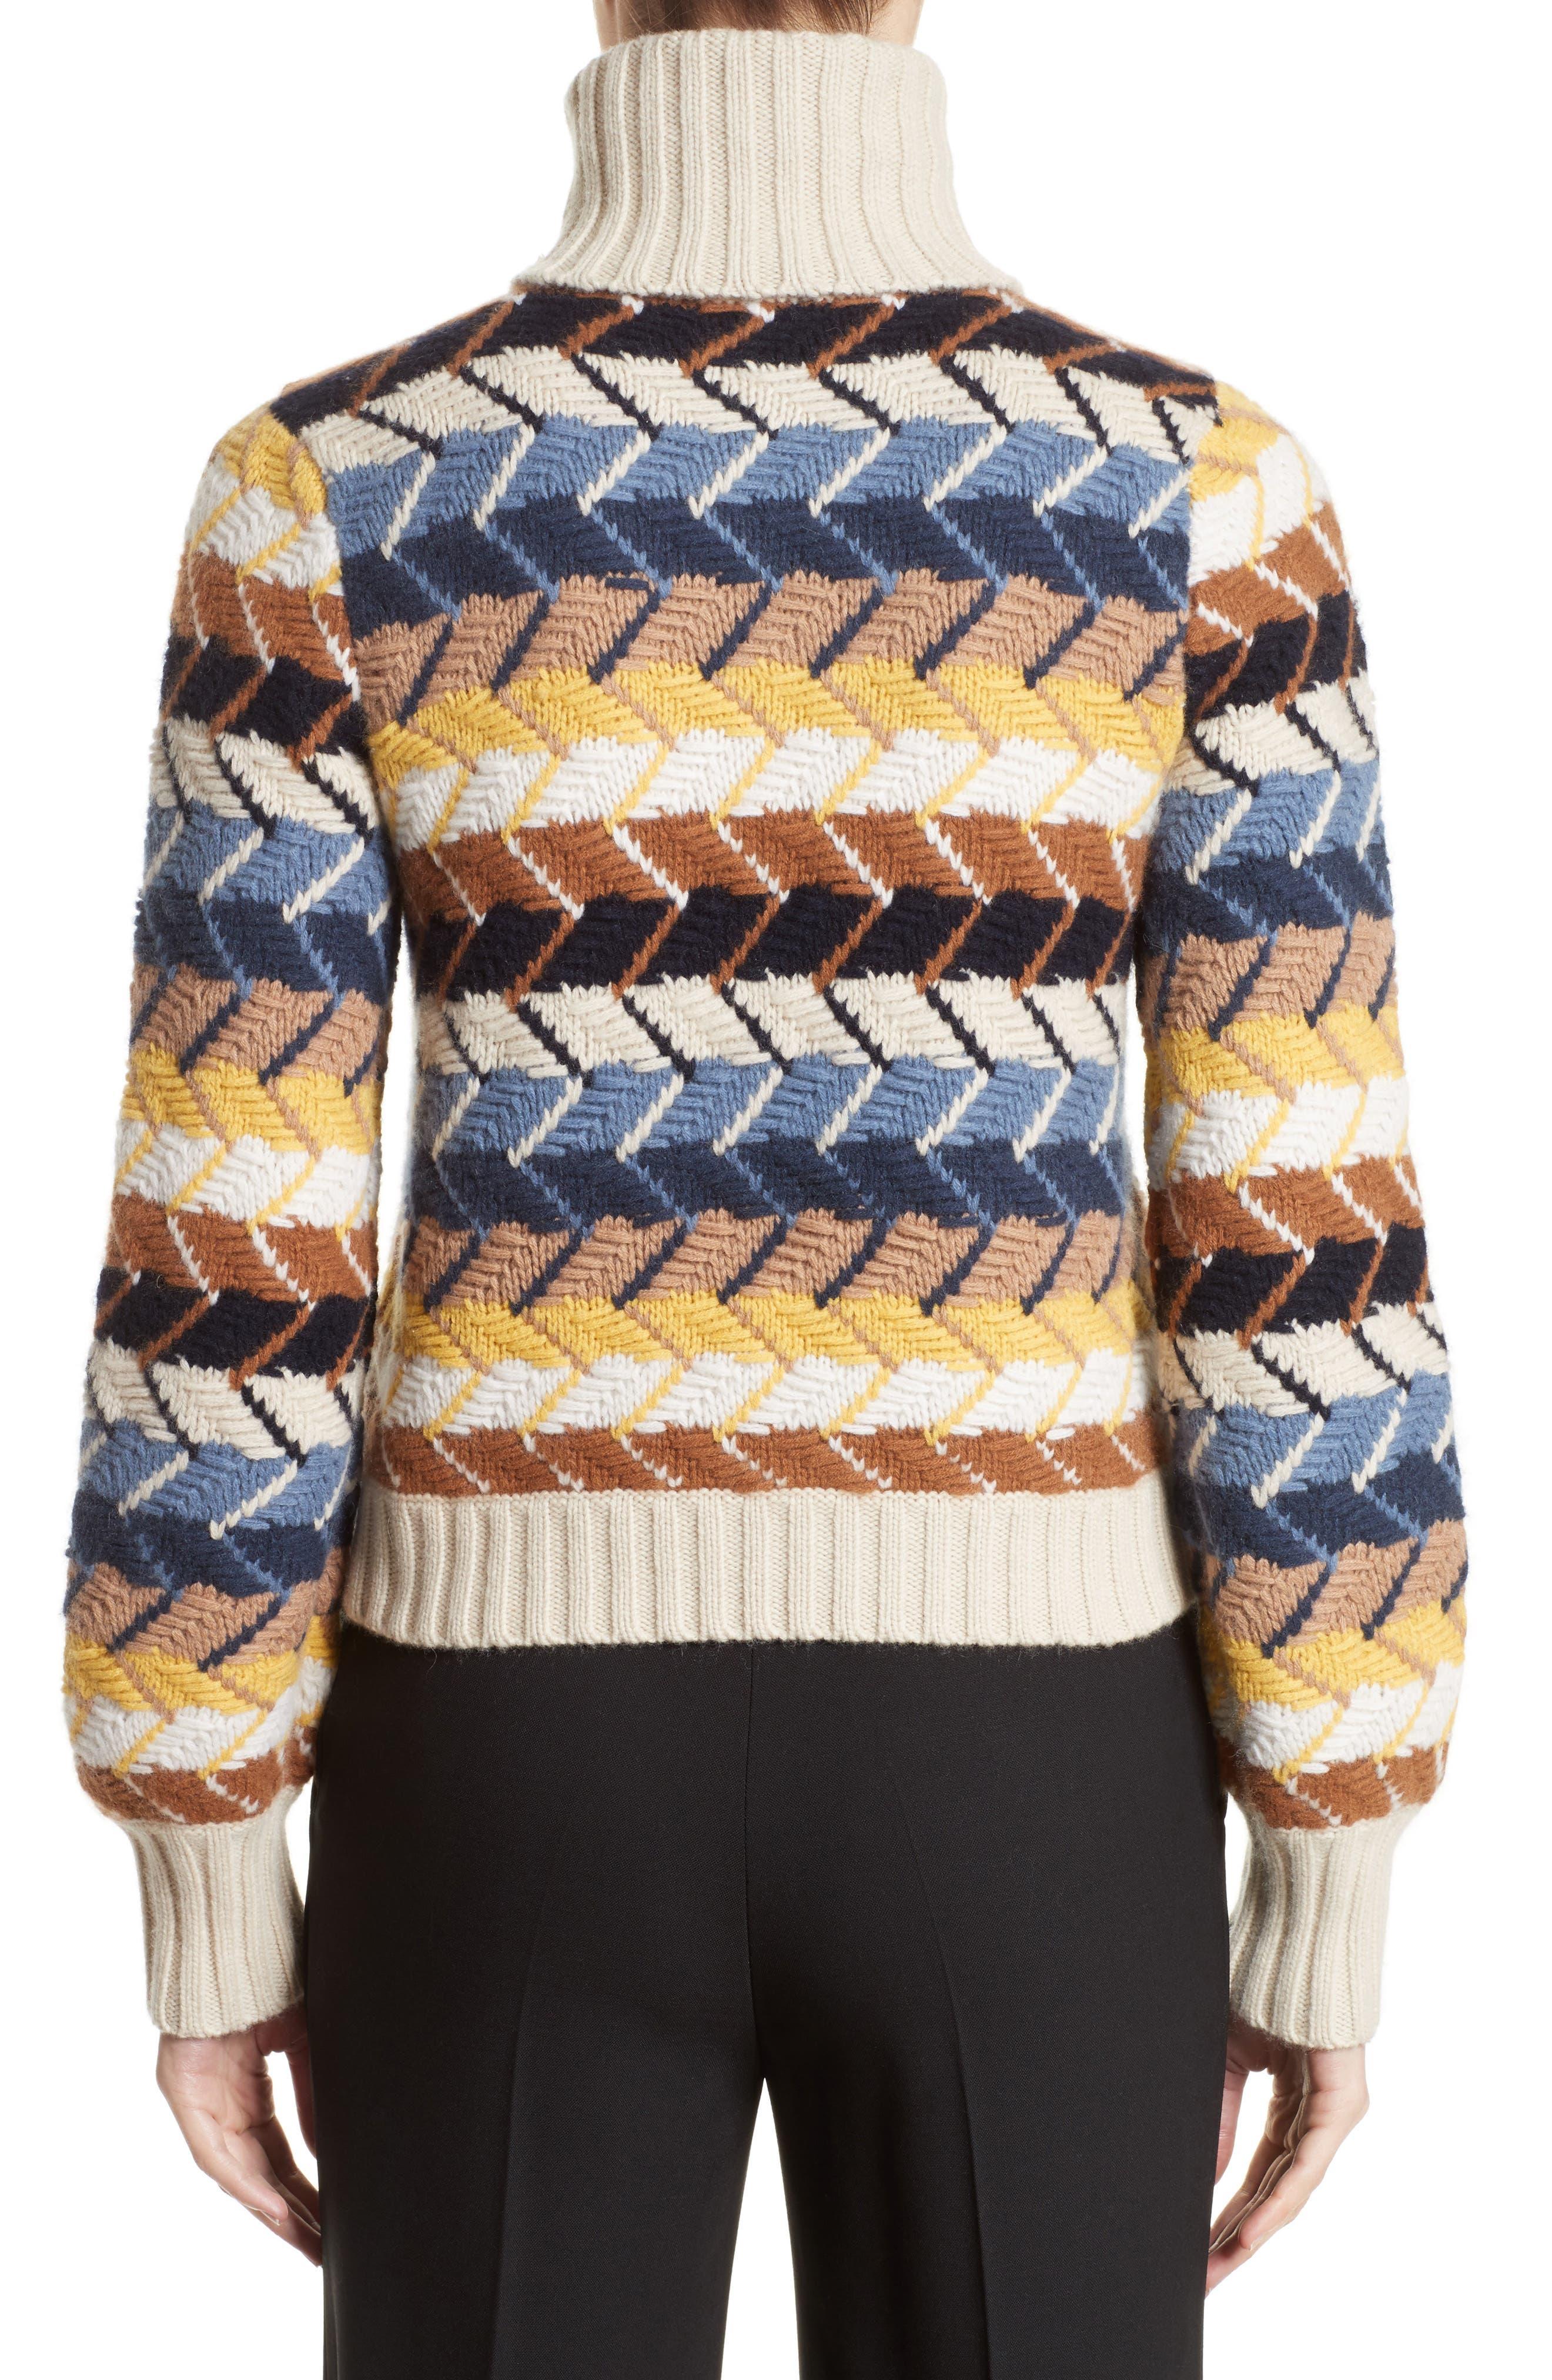 Herringbone Wool & Cashmere Turtleneck Sweater,                             Alternate thumbnail 2, color,                             Multicolor Blue